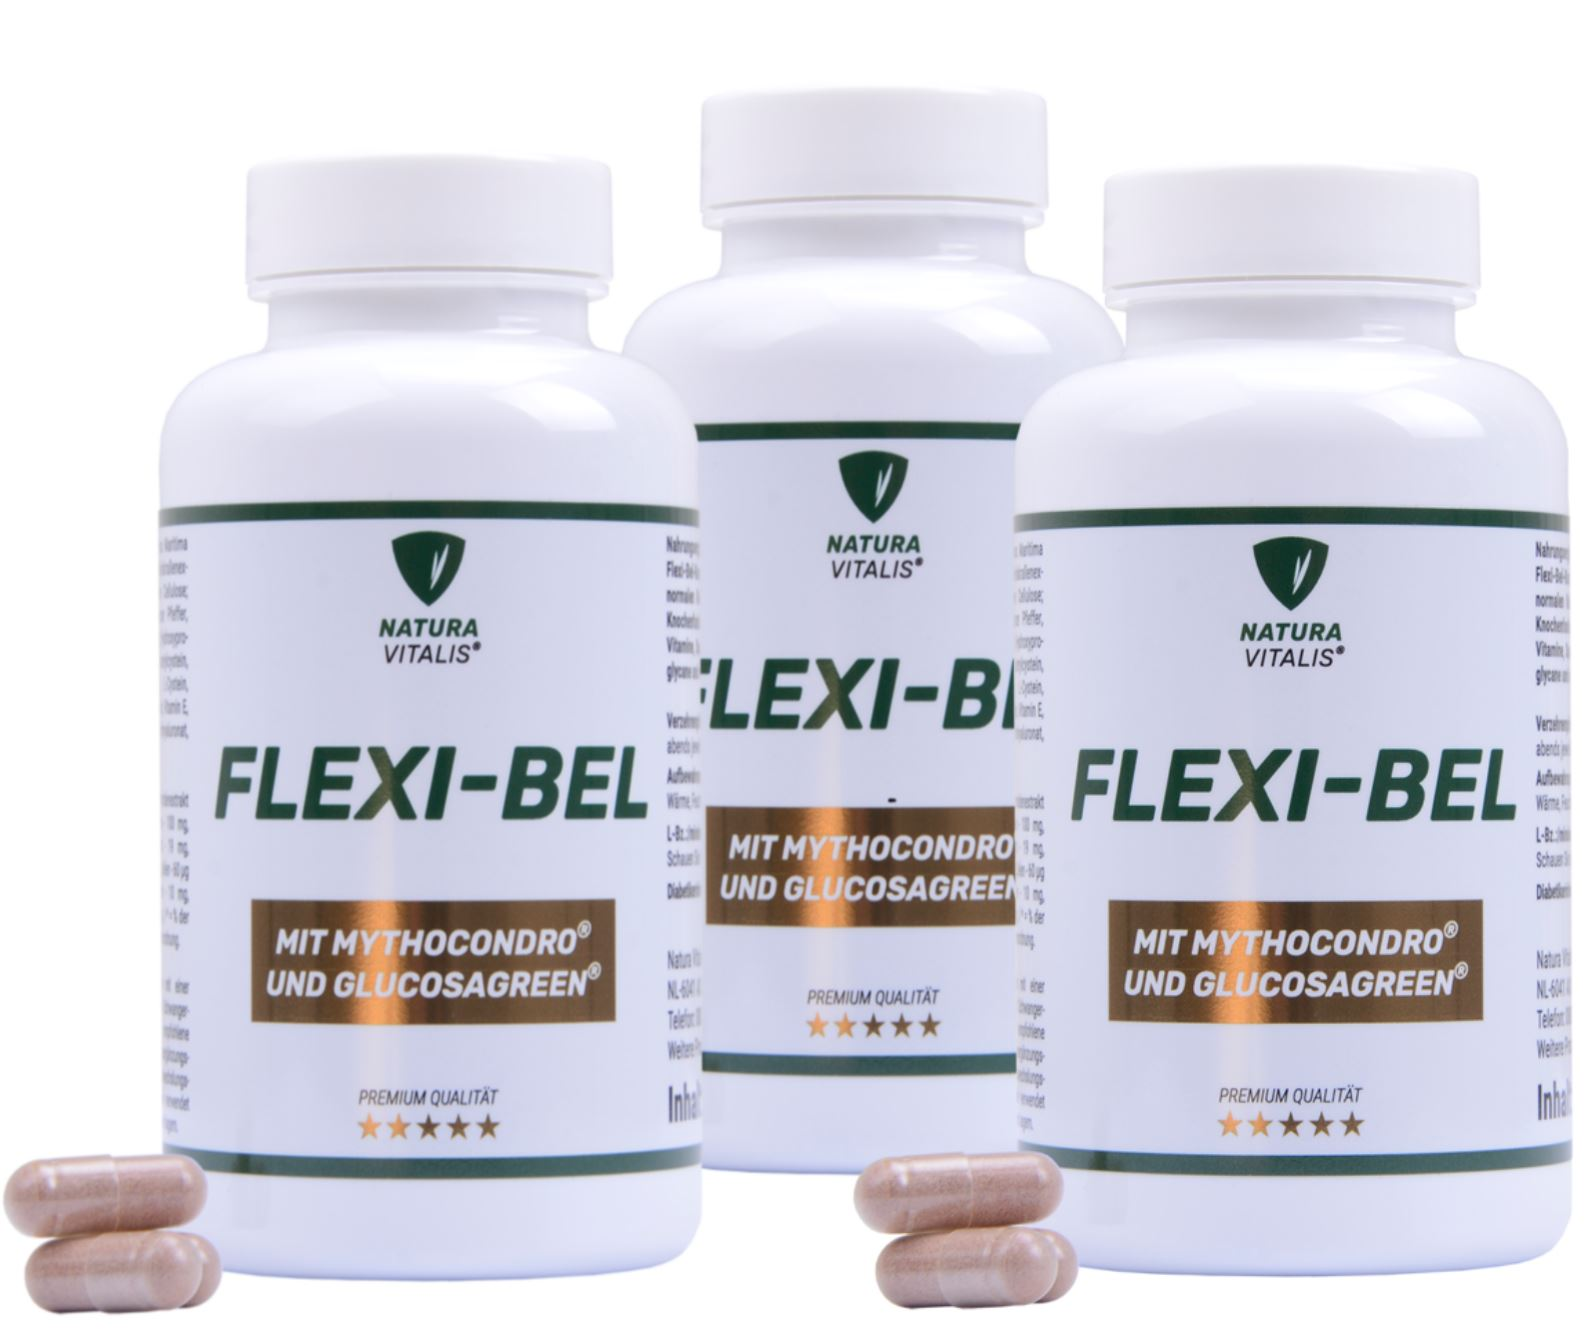 Flexi-Bel 360 Kapseln von Natura Vitalis®